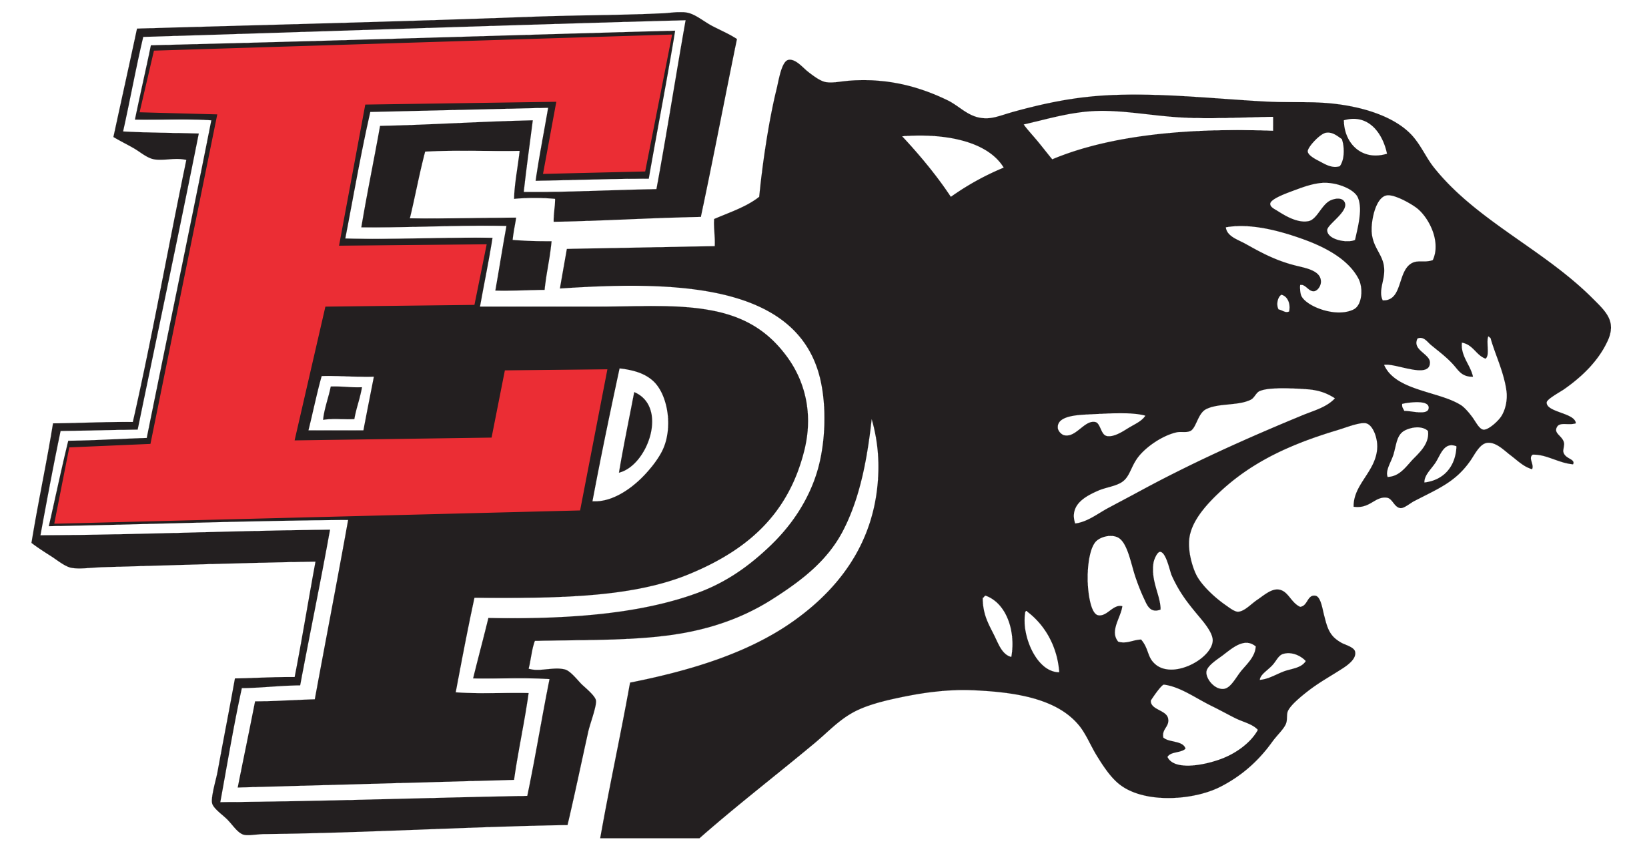 Fall E P Panther Spirit Wear Ecusd